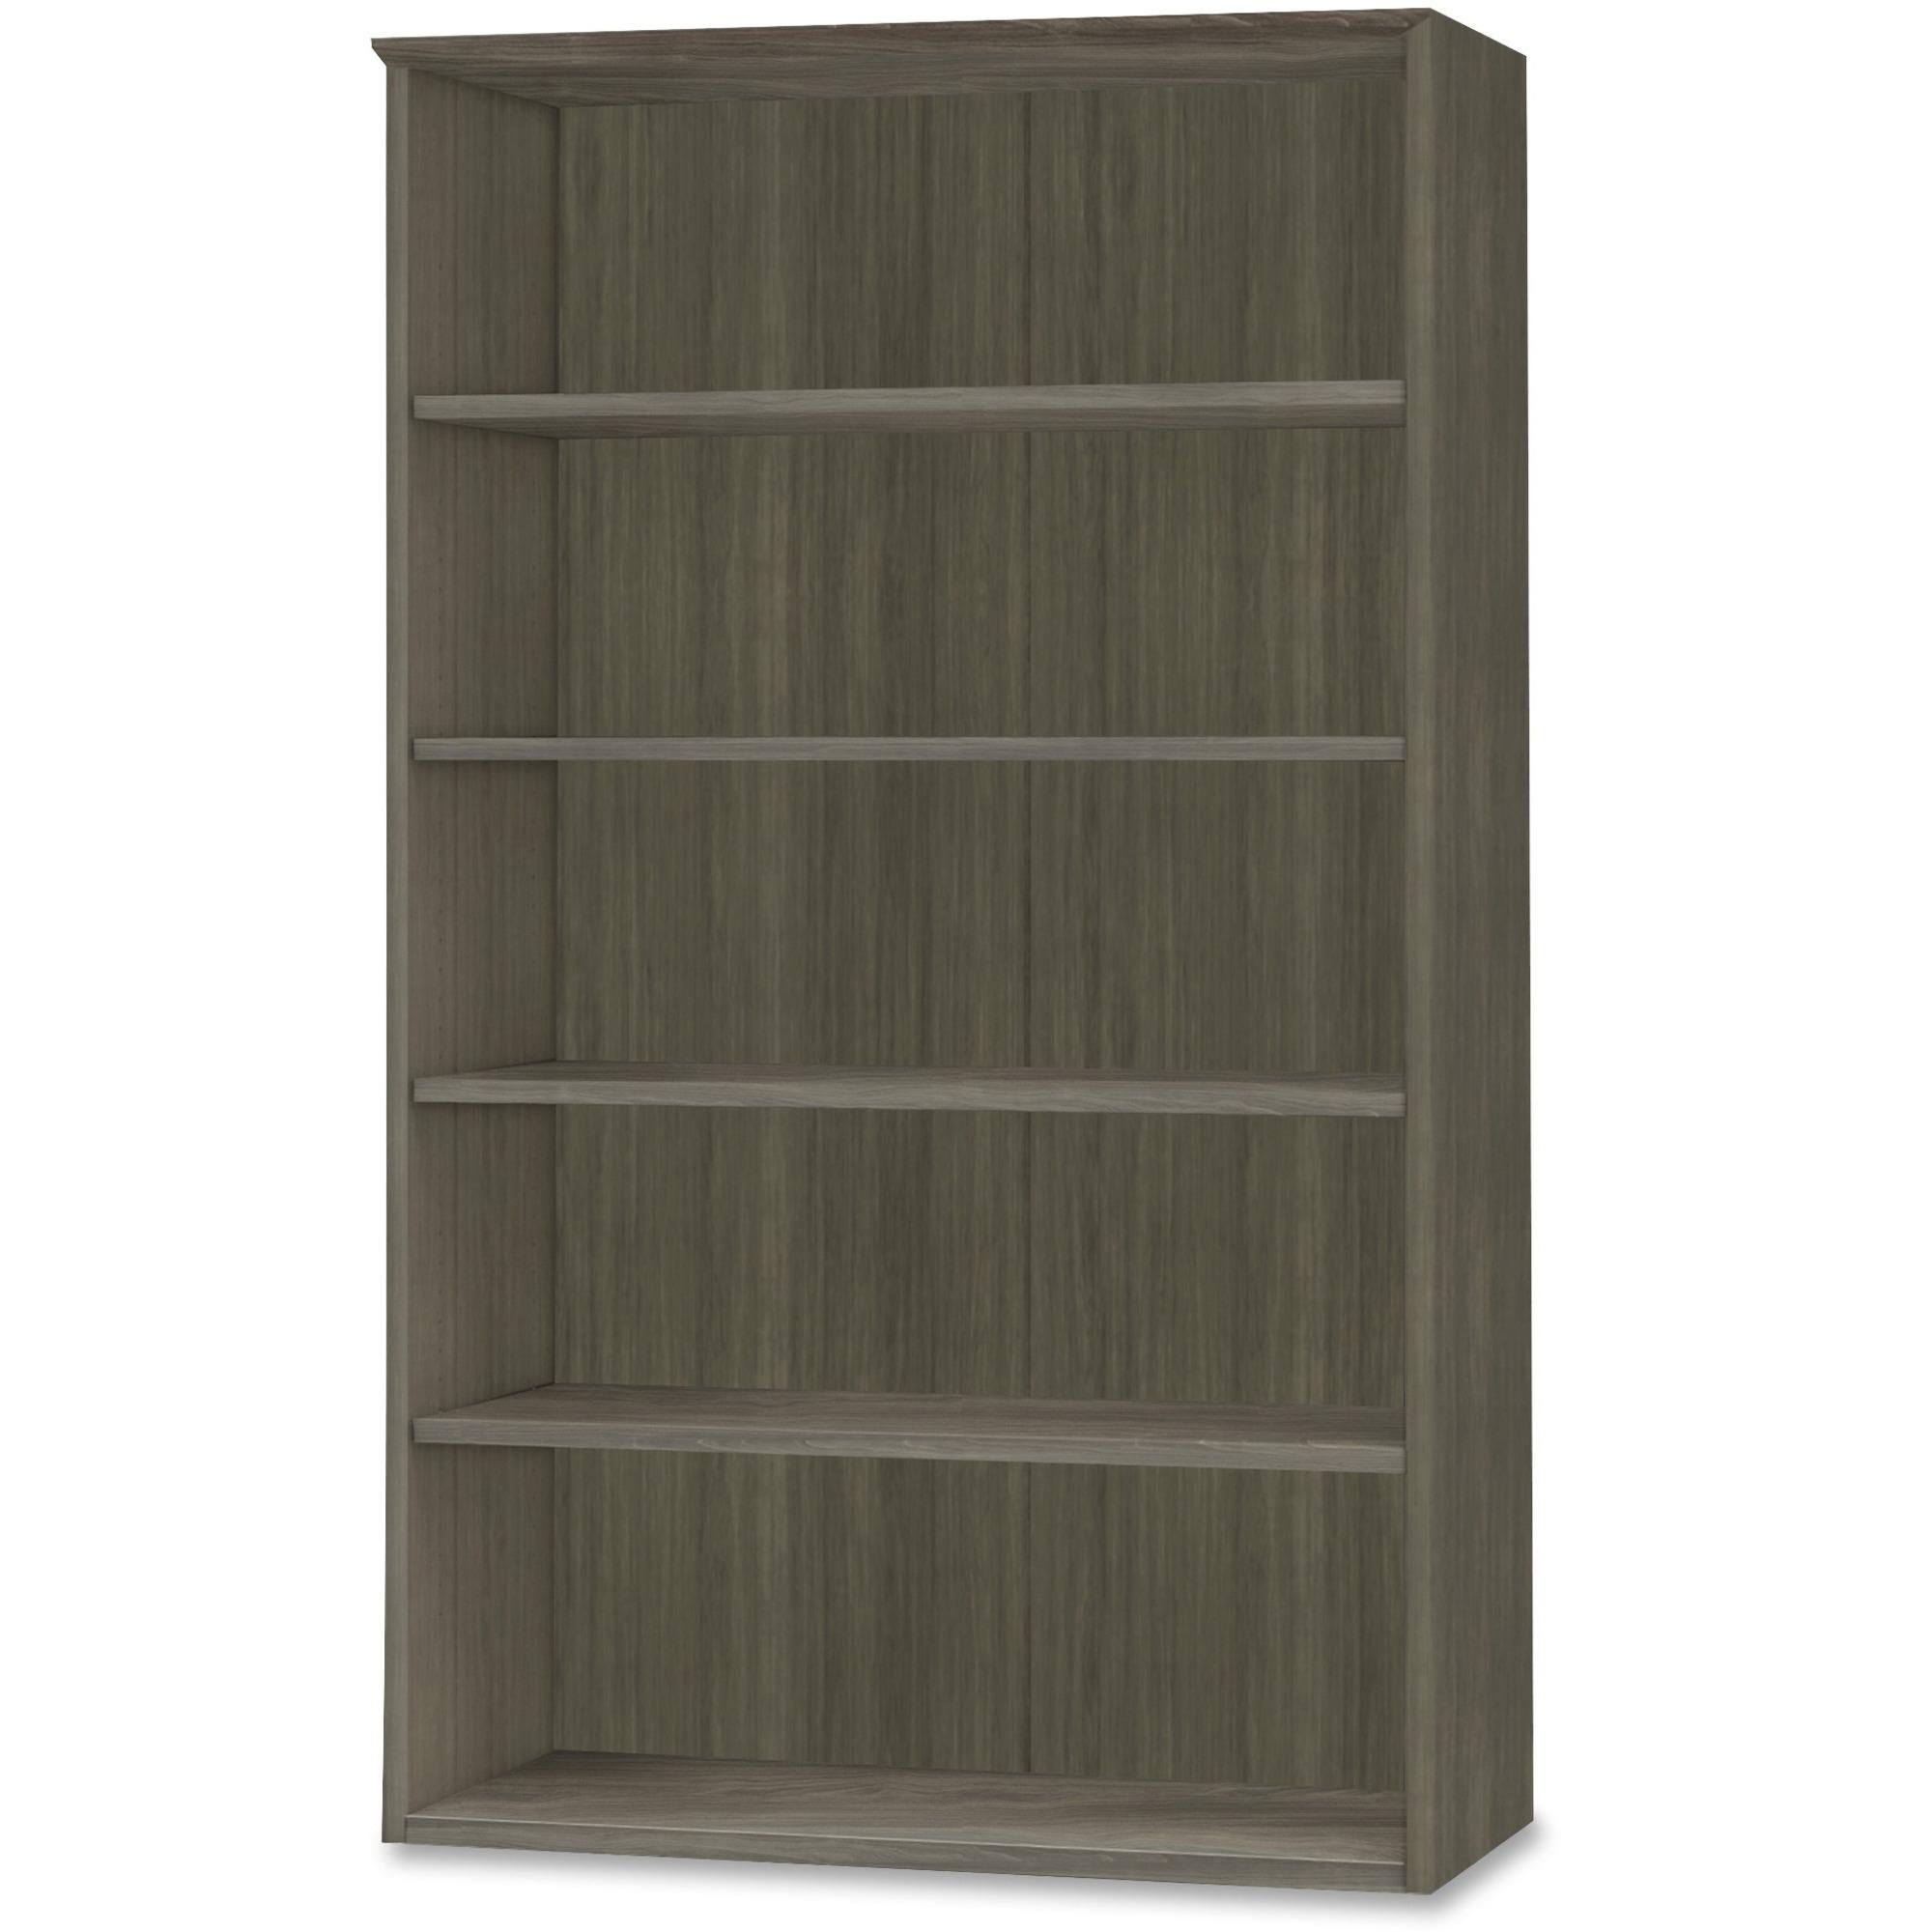 Mayline Group Mayline Medina Series Gray Laminate. 5-shelf Bookcase - 36 X 13 X 68BOOKSHELF, 1 Shelf - 5 Shelve(S) - Finish: Gray Steel Laminate